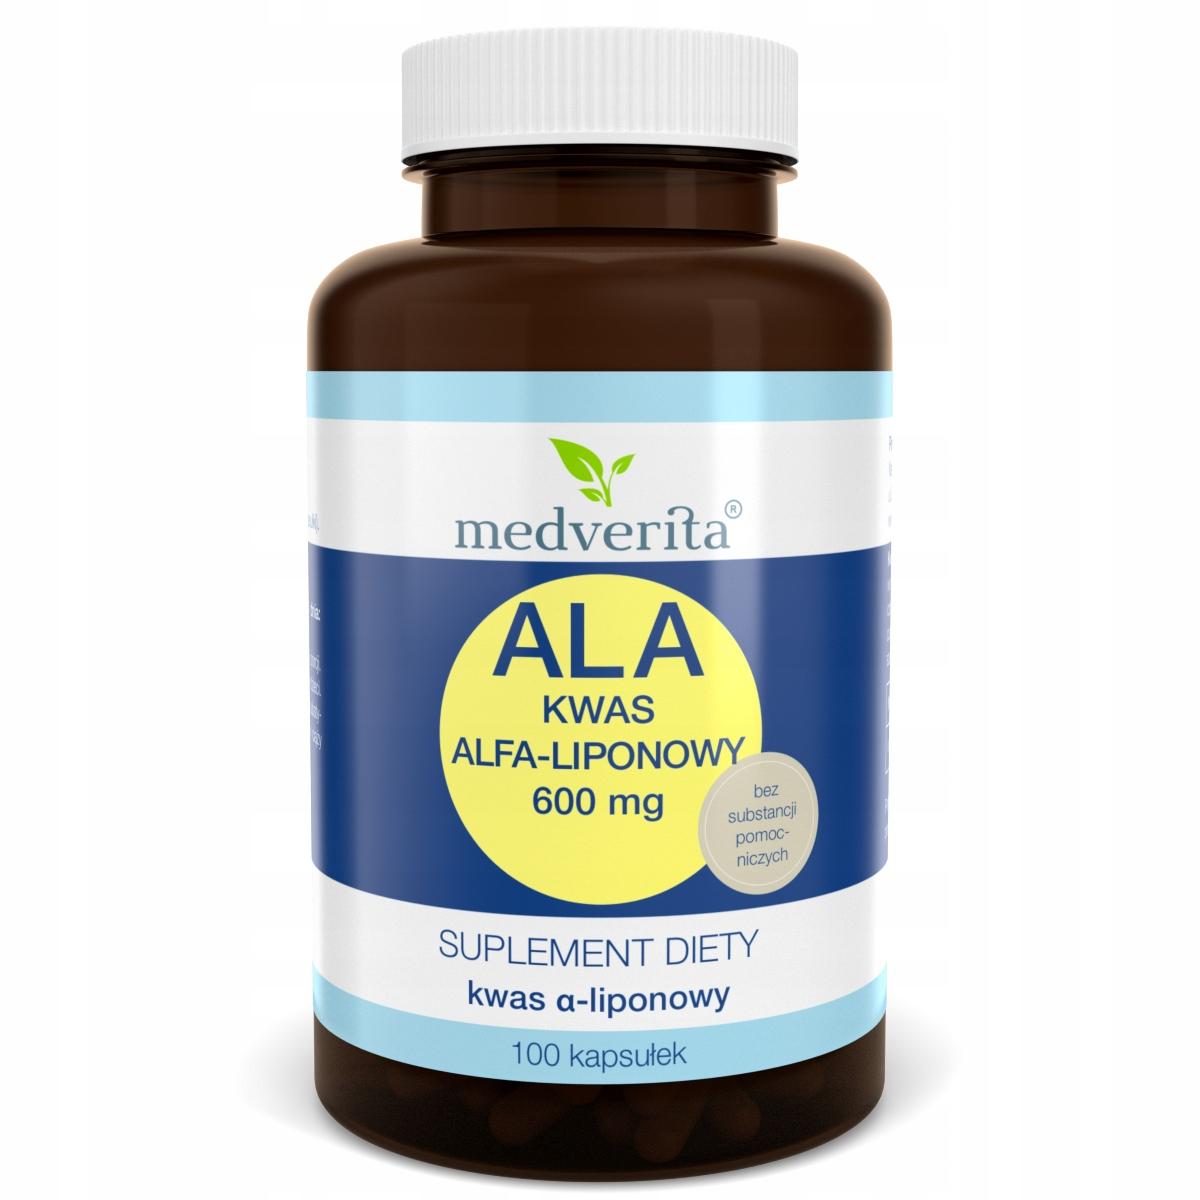 ALA 600 mg Kwas alfa-liponowy - 100 kapsułek